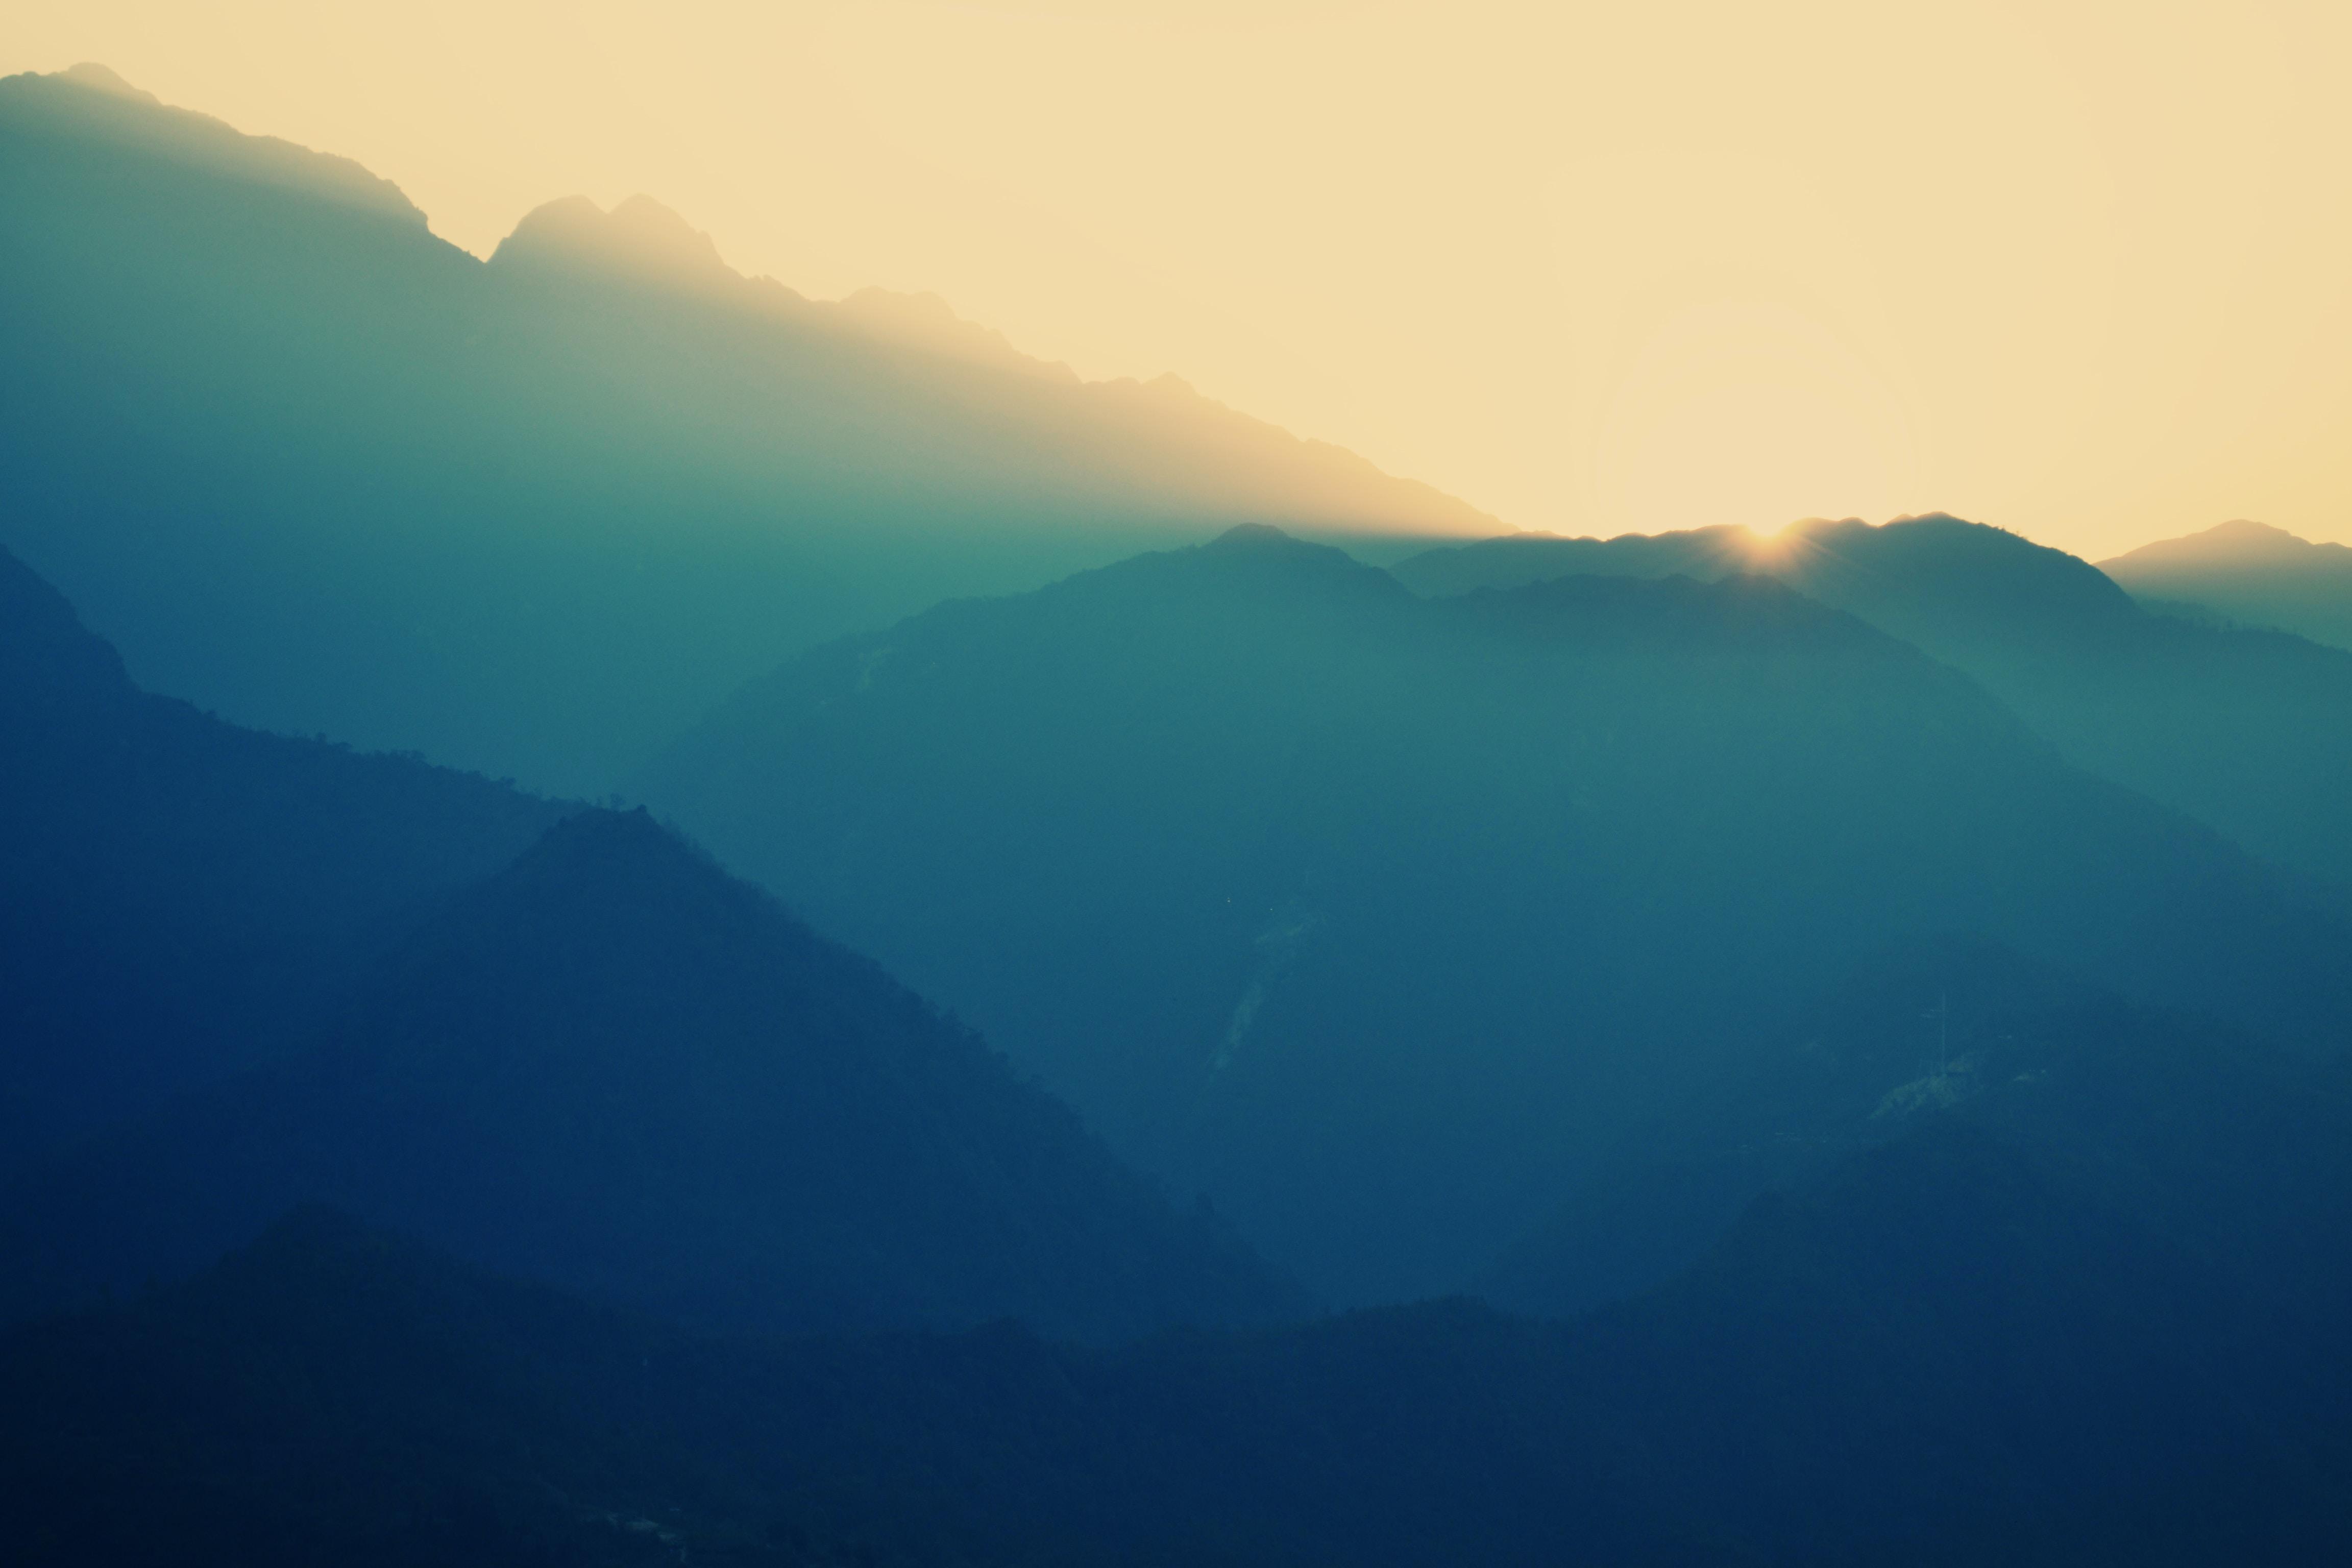 A hazy shot of high mountain ridges during sunset